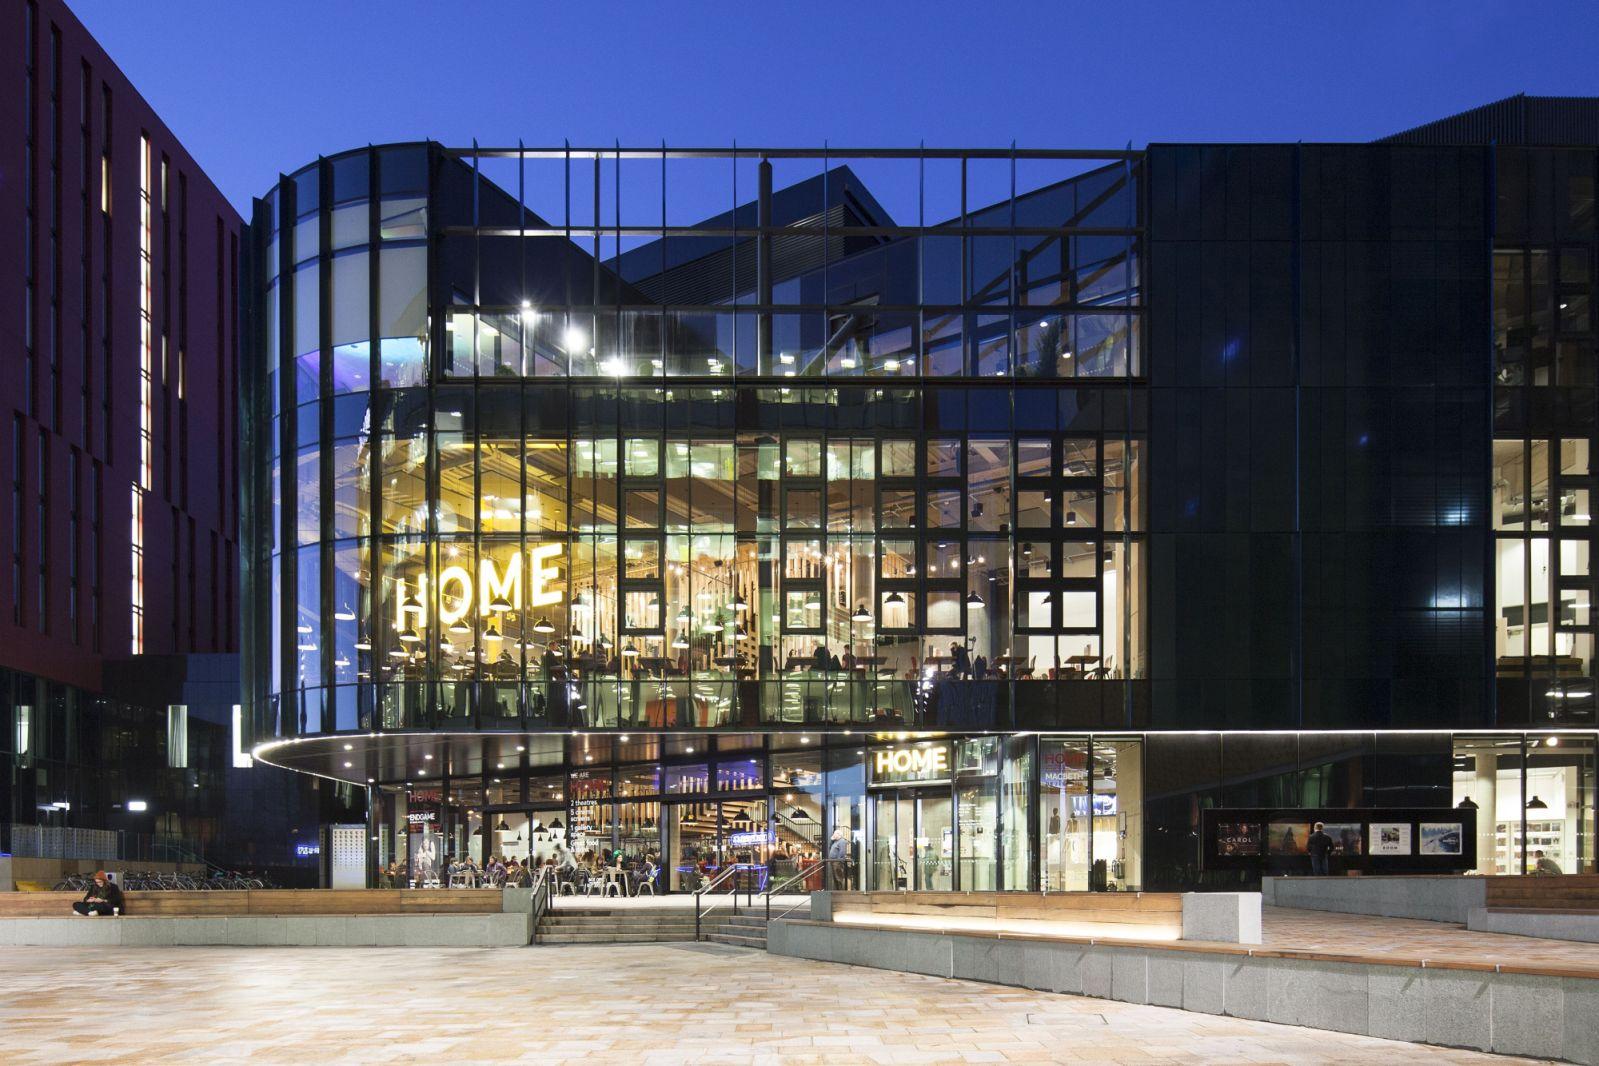 HOME Arts Centre